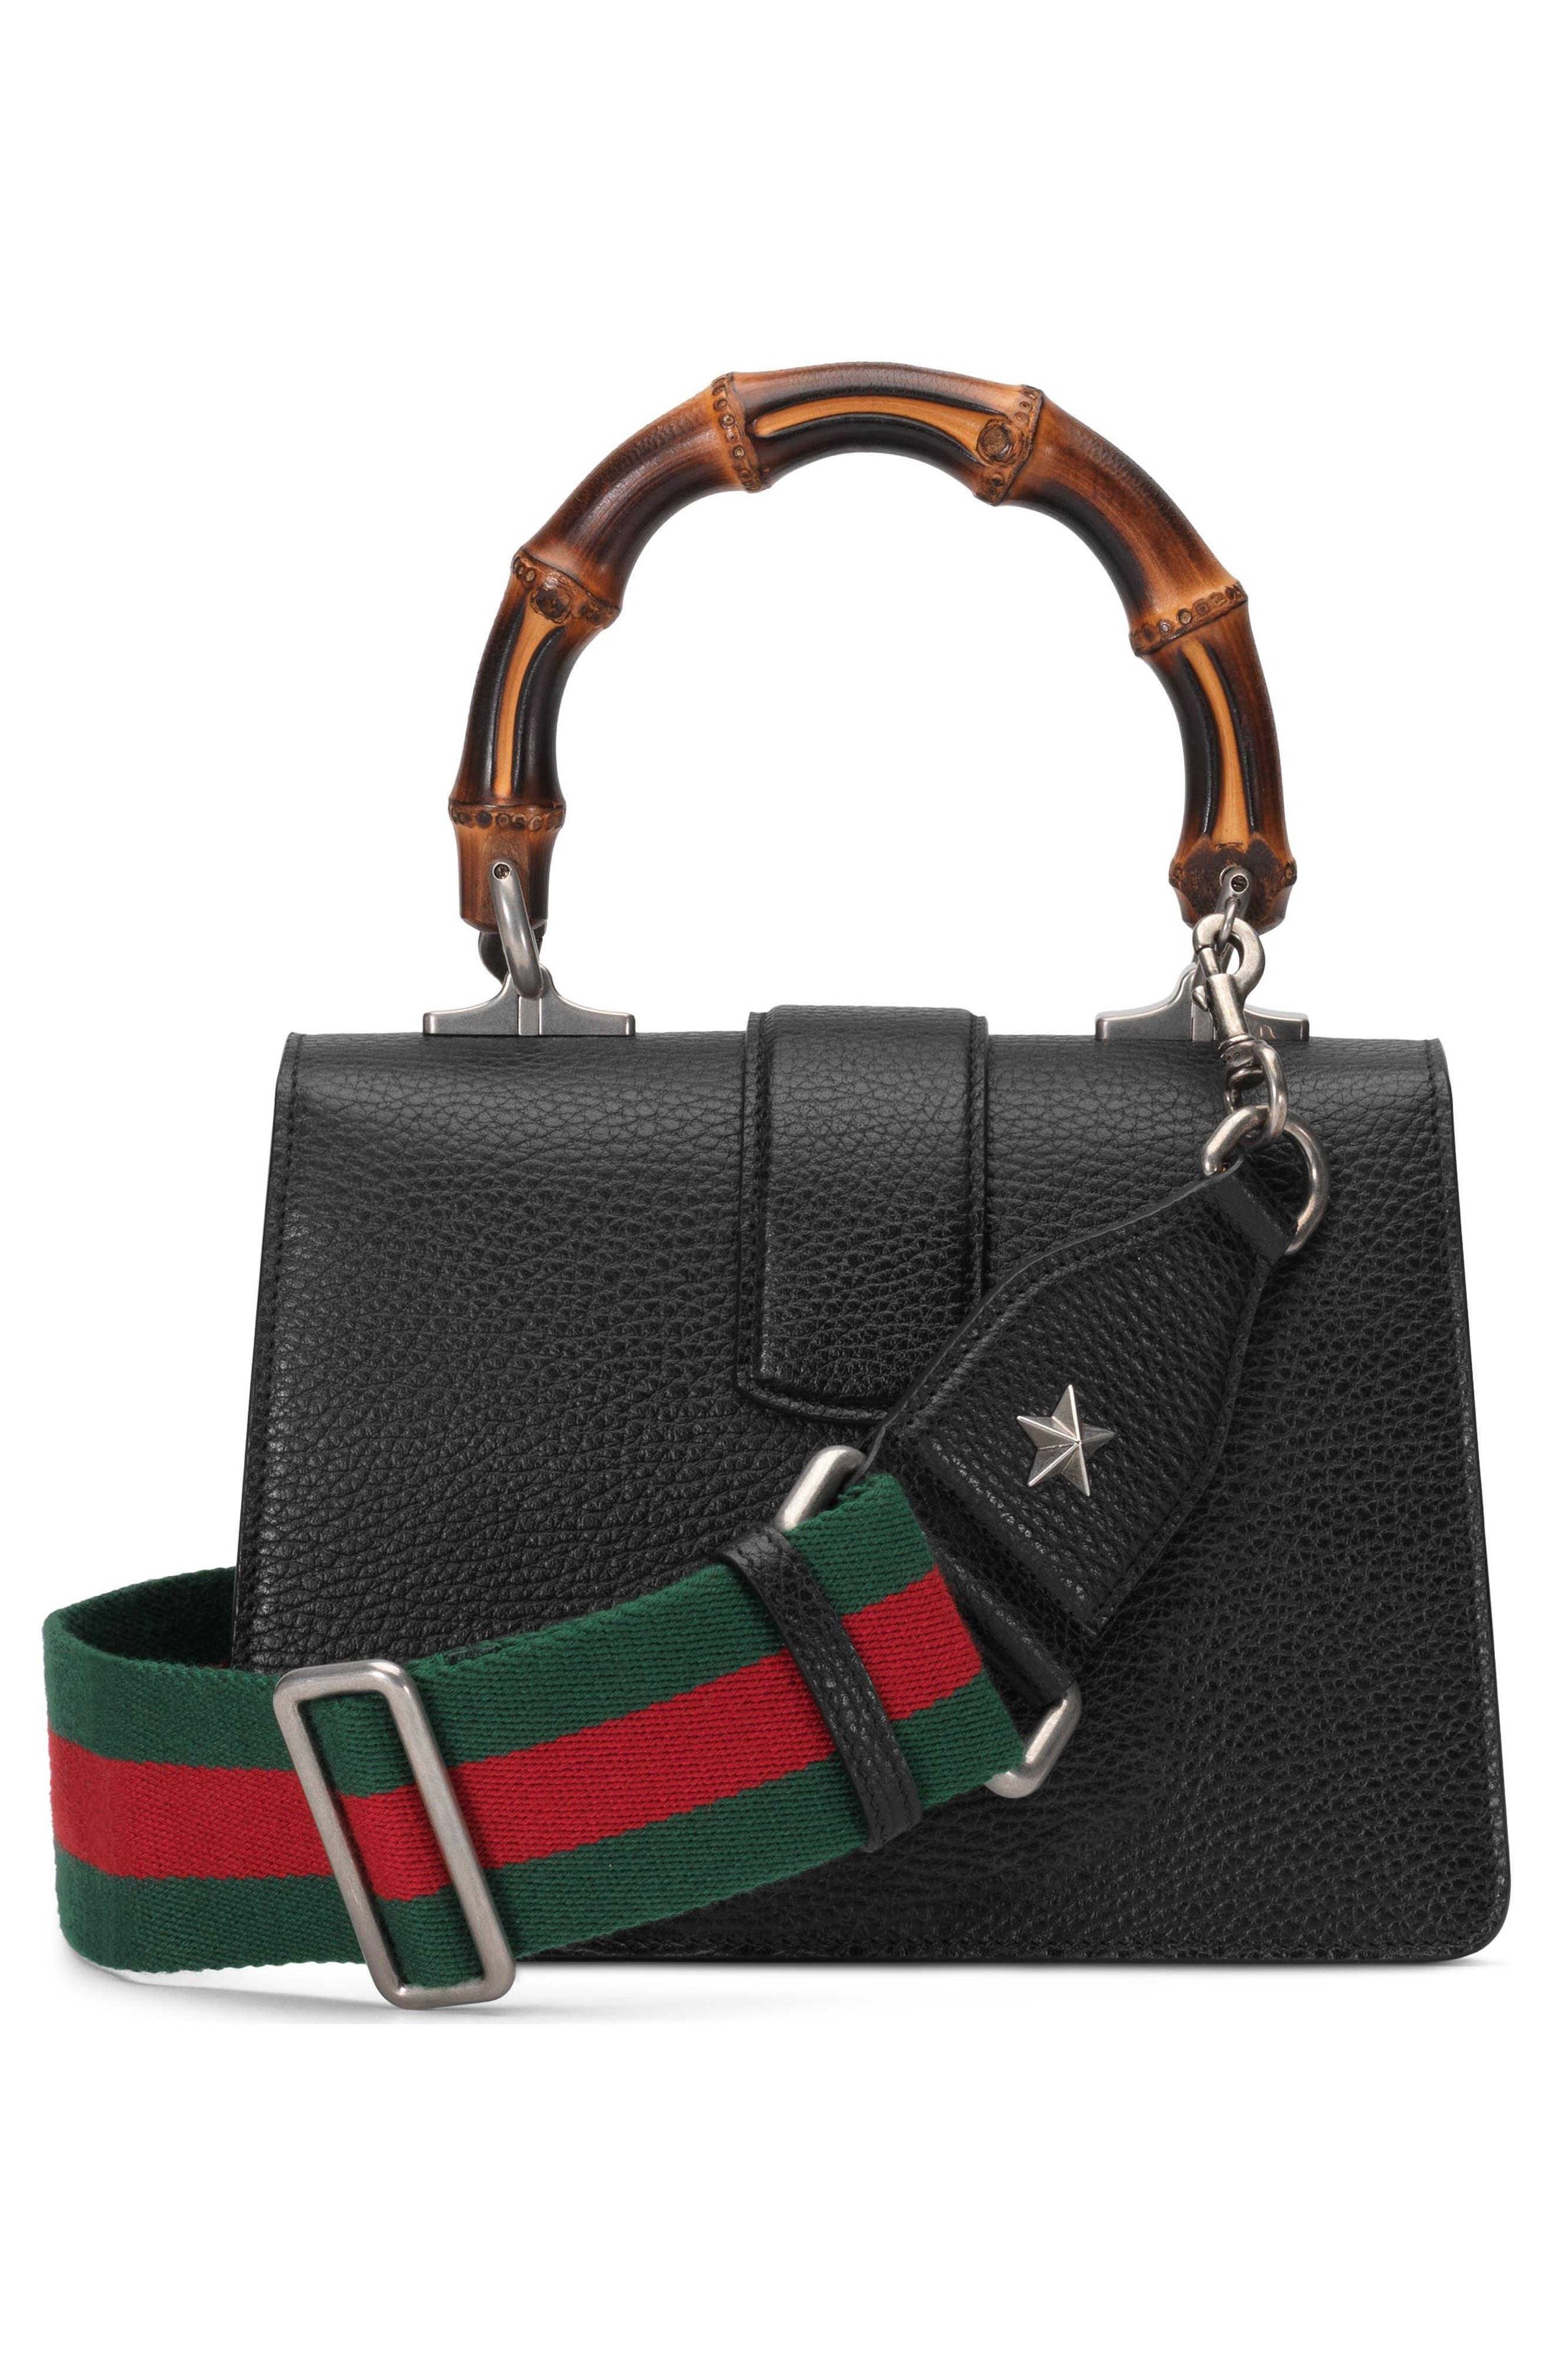 Mini Dionysus Leather Top Handle Satchel,                             Alternate thumbnail 2, color,                             NERO/ VERT RED/ BLACK DIAMOND